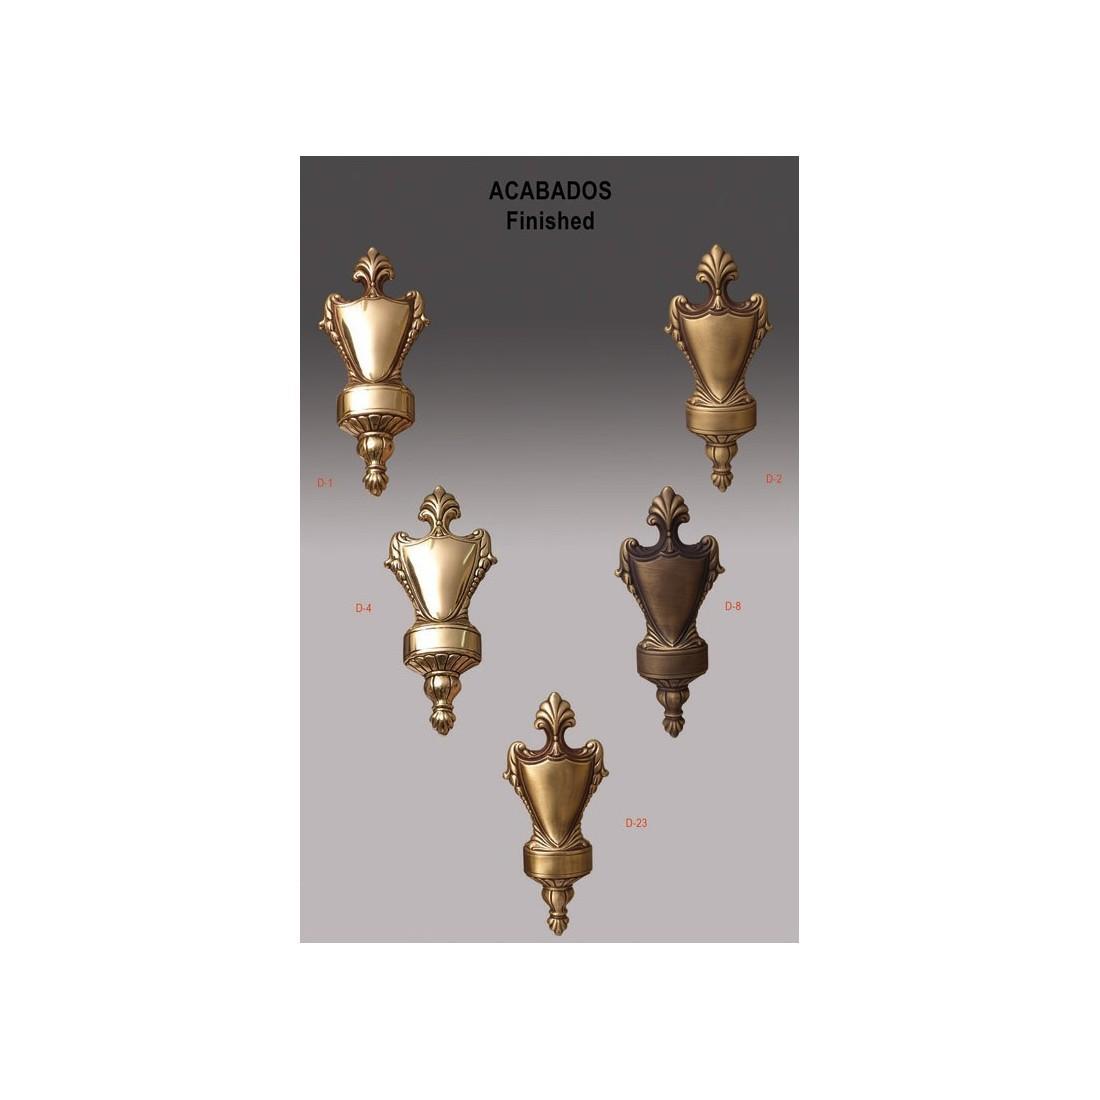 Pie de mesita para dormitorio cl sico de bronce - Lamparas clasicas modernas ...